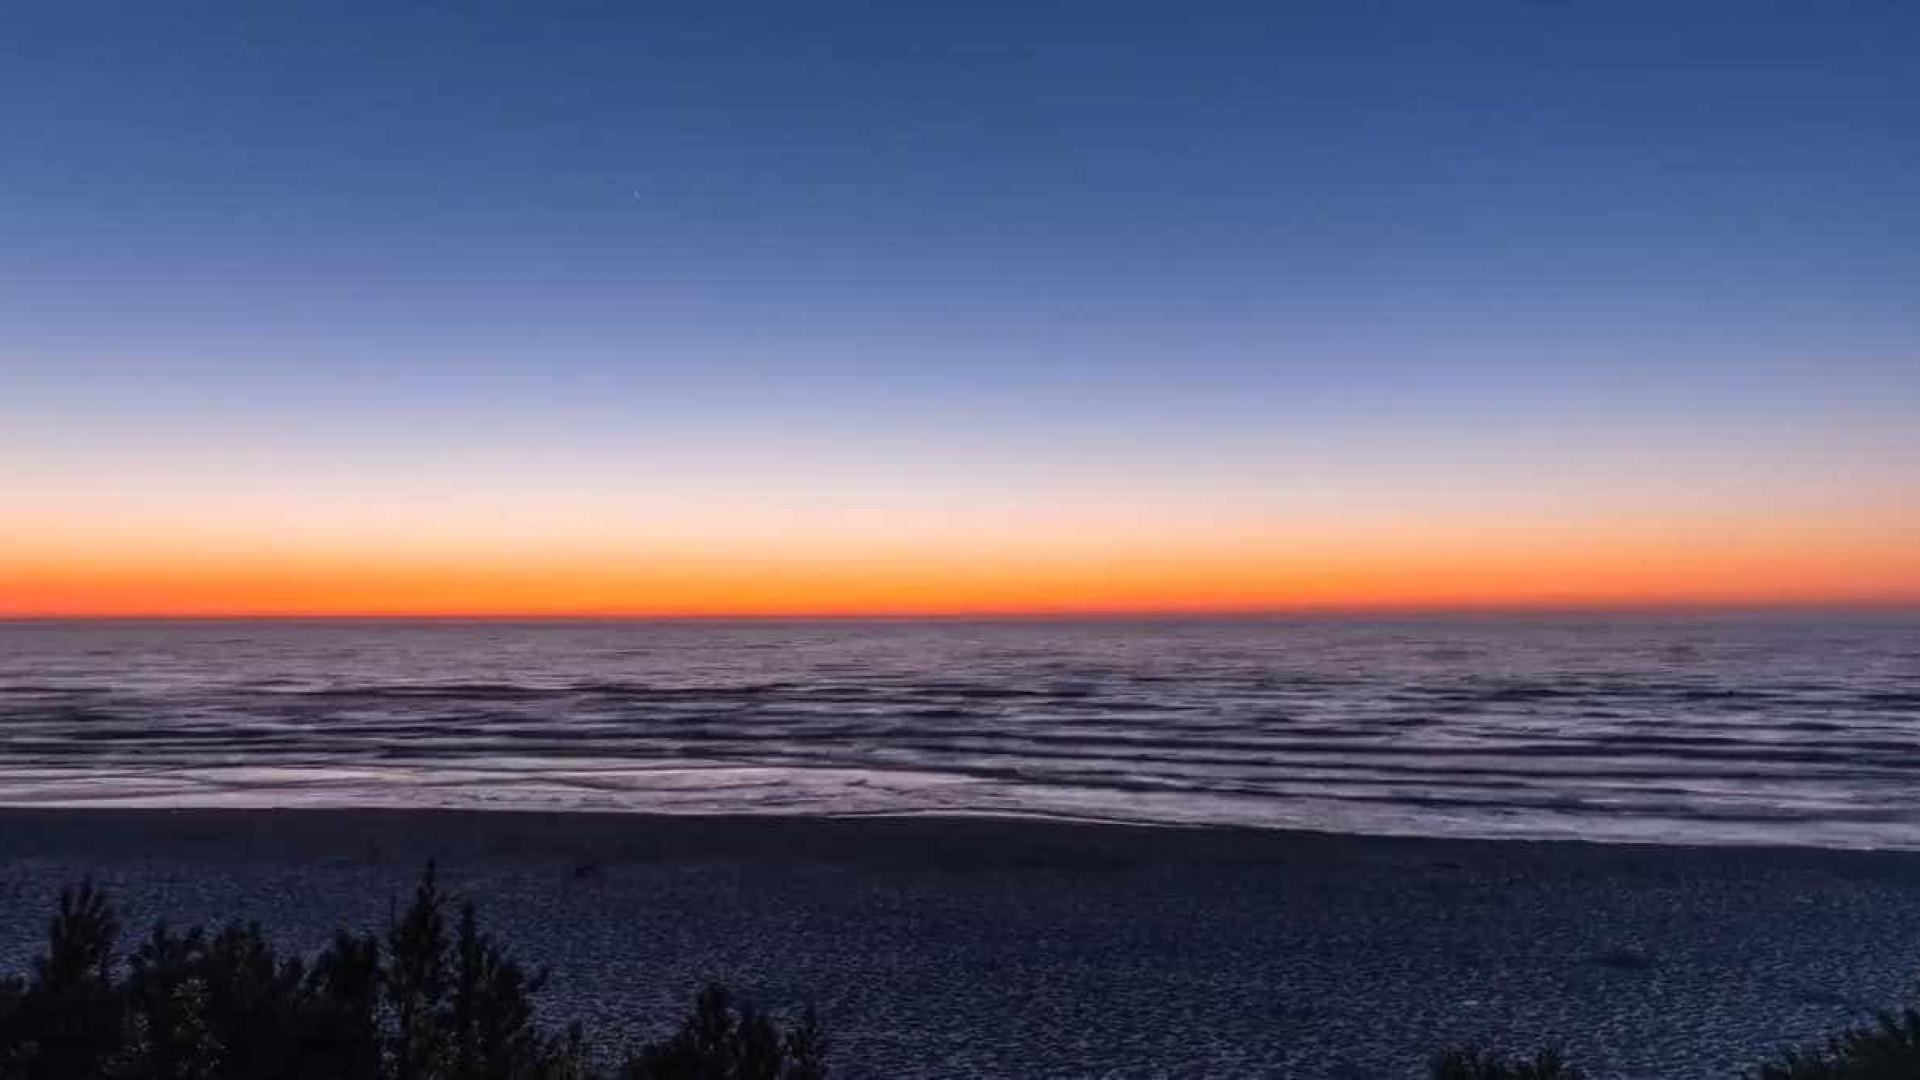 Beleza natural: o nascer e o pôr do sol no Mar Báltico